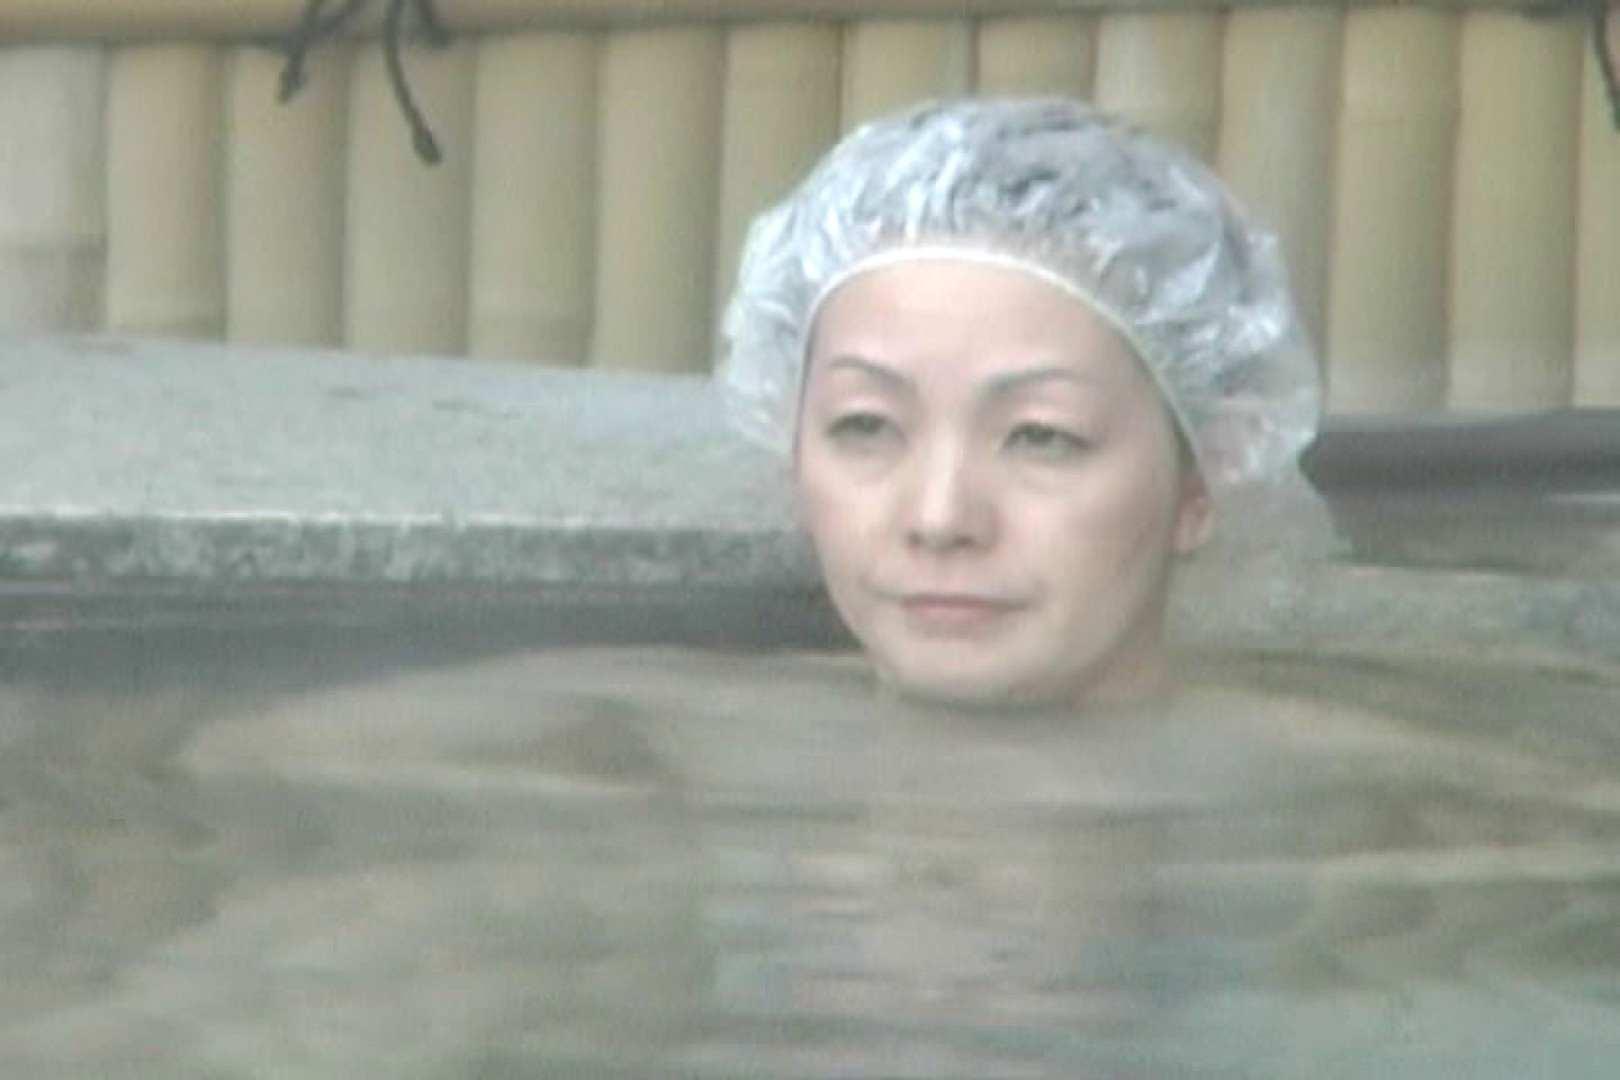 Aquaな露天風呂Vol.592 盗撮師作品  91pic 69